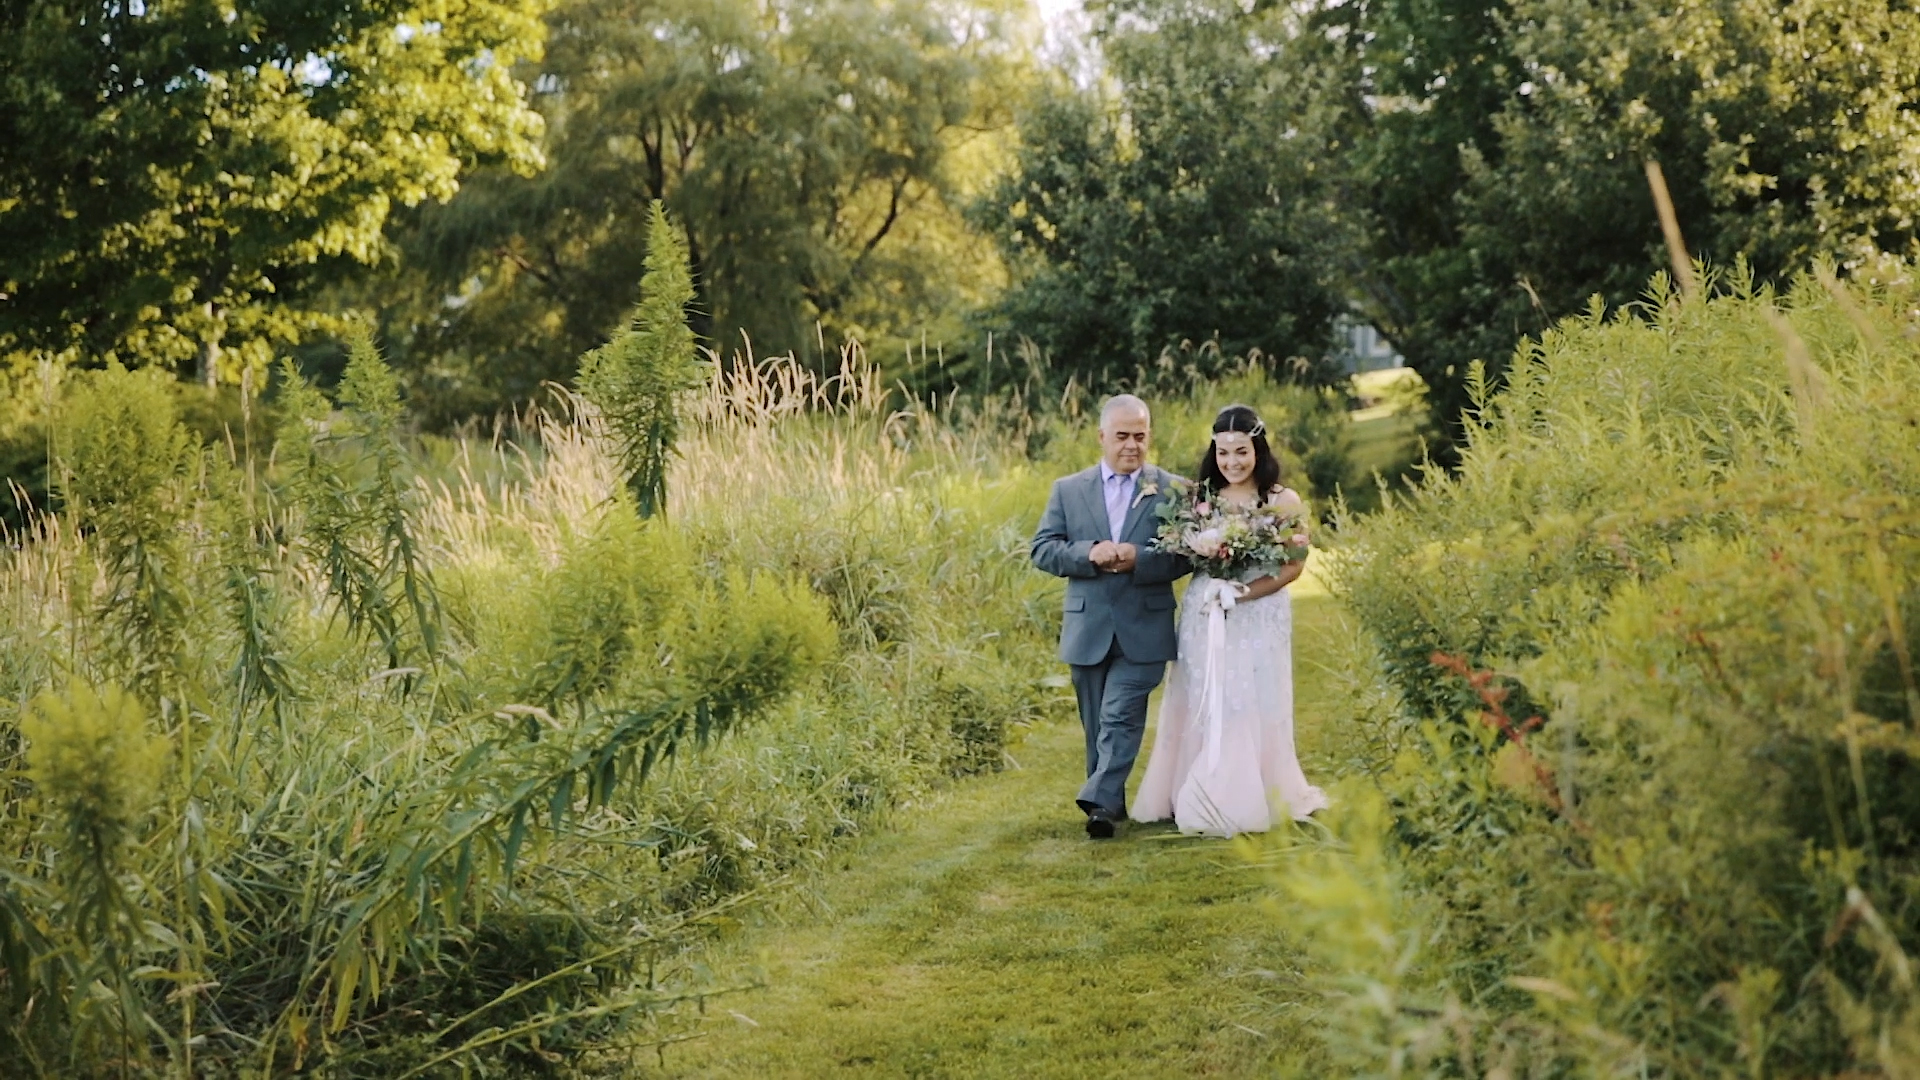 Janet + Daniel   Andes, New York   Willow drey Farm